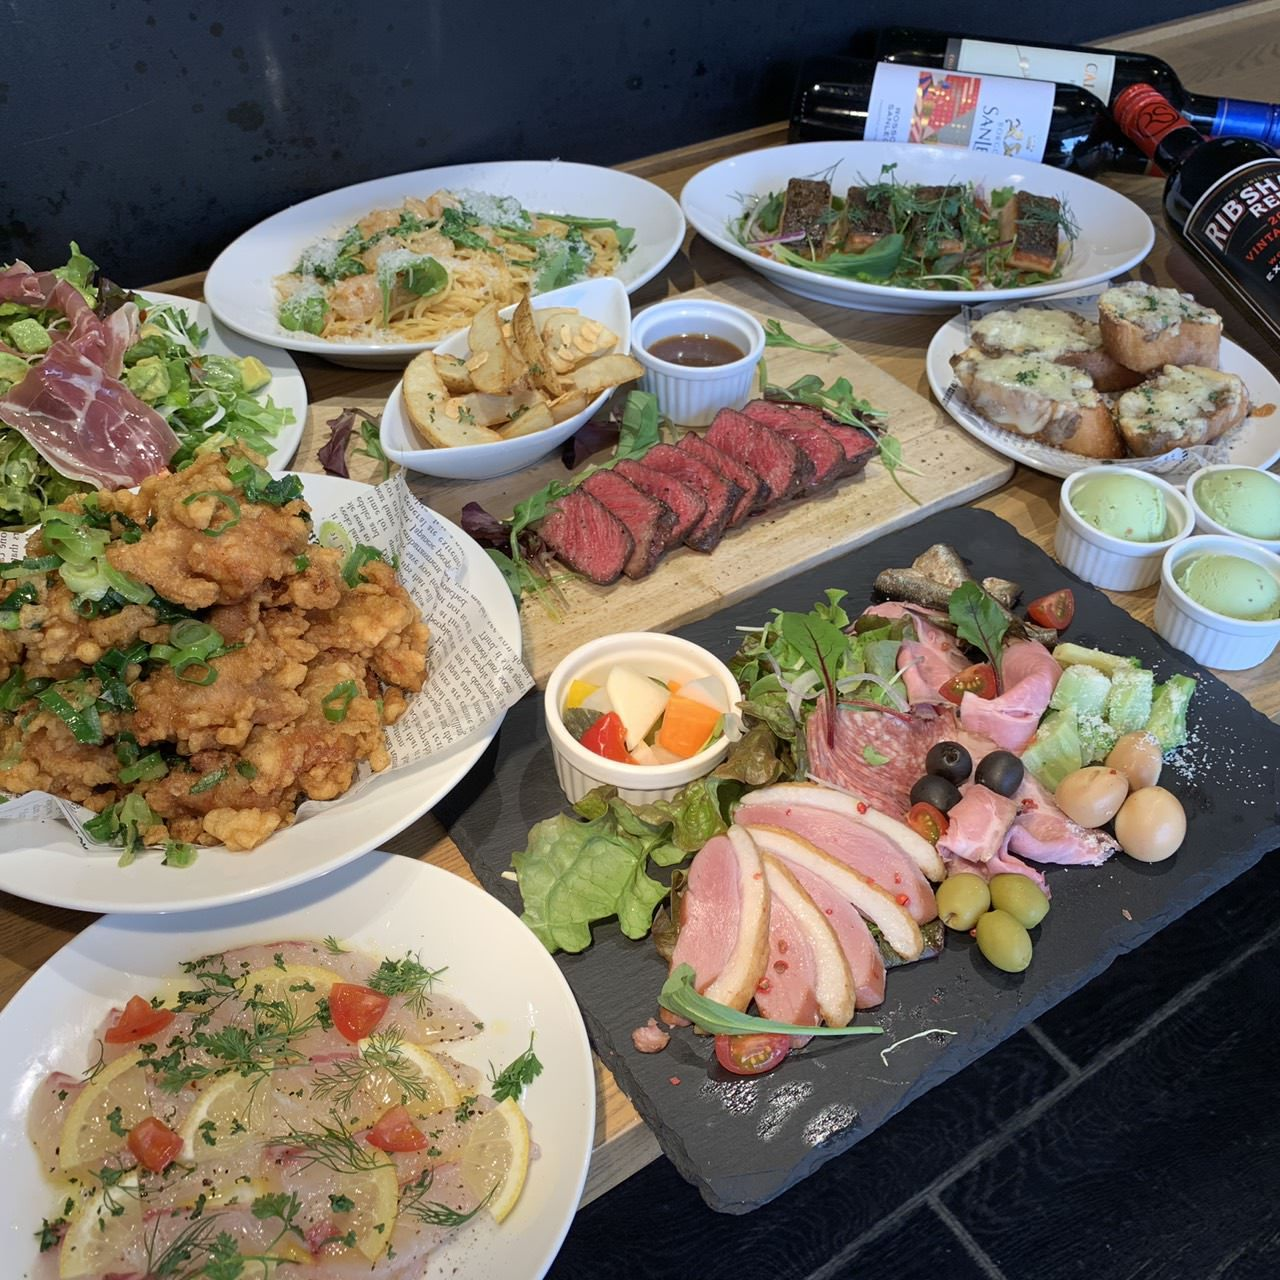 【2H飲み放題付】厳選素材!特選牛ステーキに鮮魚カルパッチョ、削りたて生ハムとアボカドの…グラッチェコース